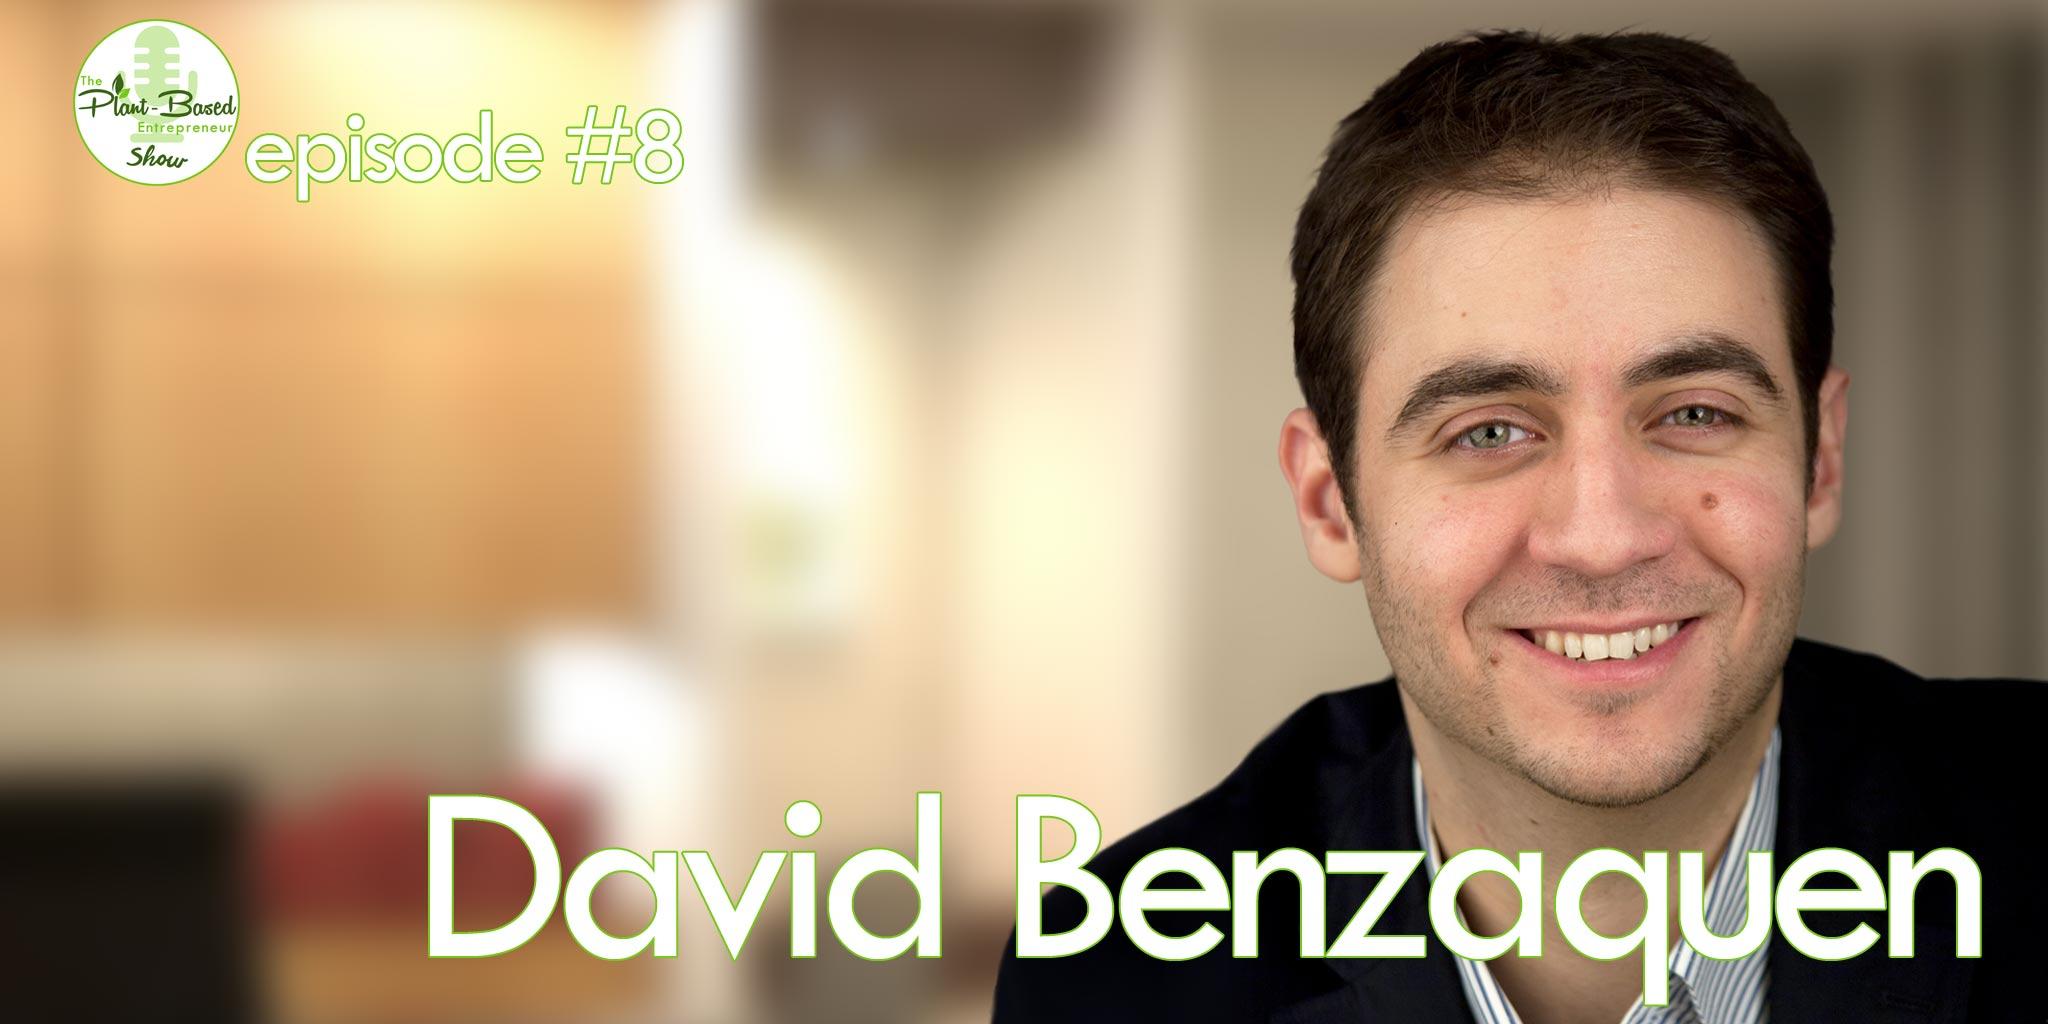 Episode #8 - David Benzaquen